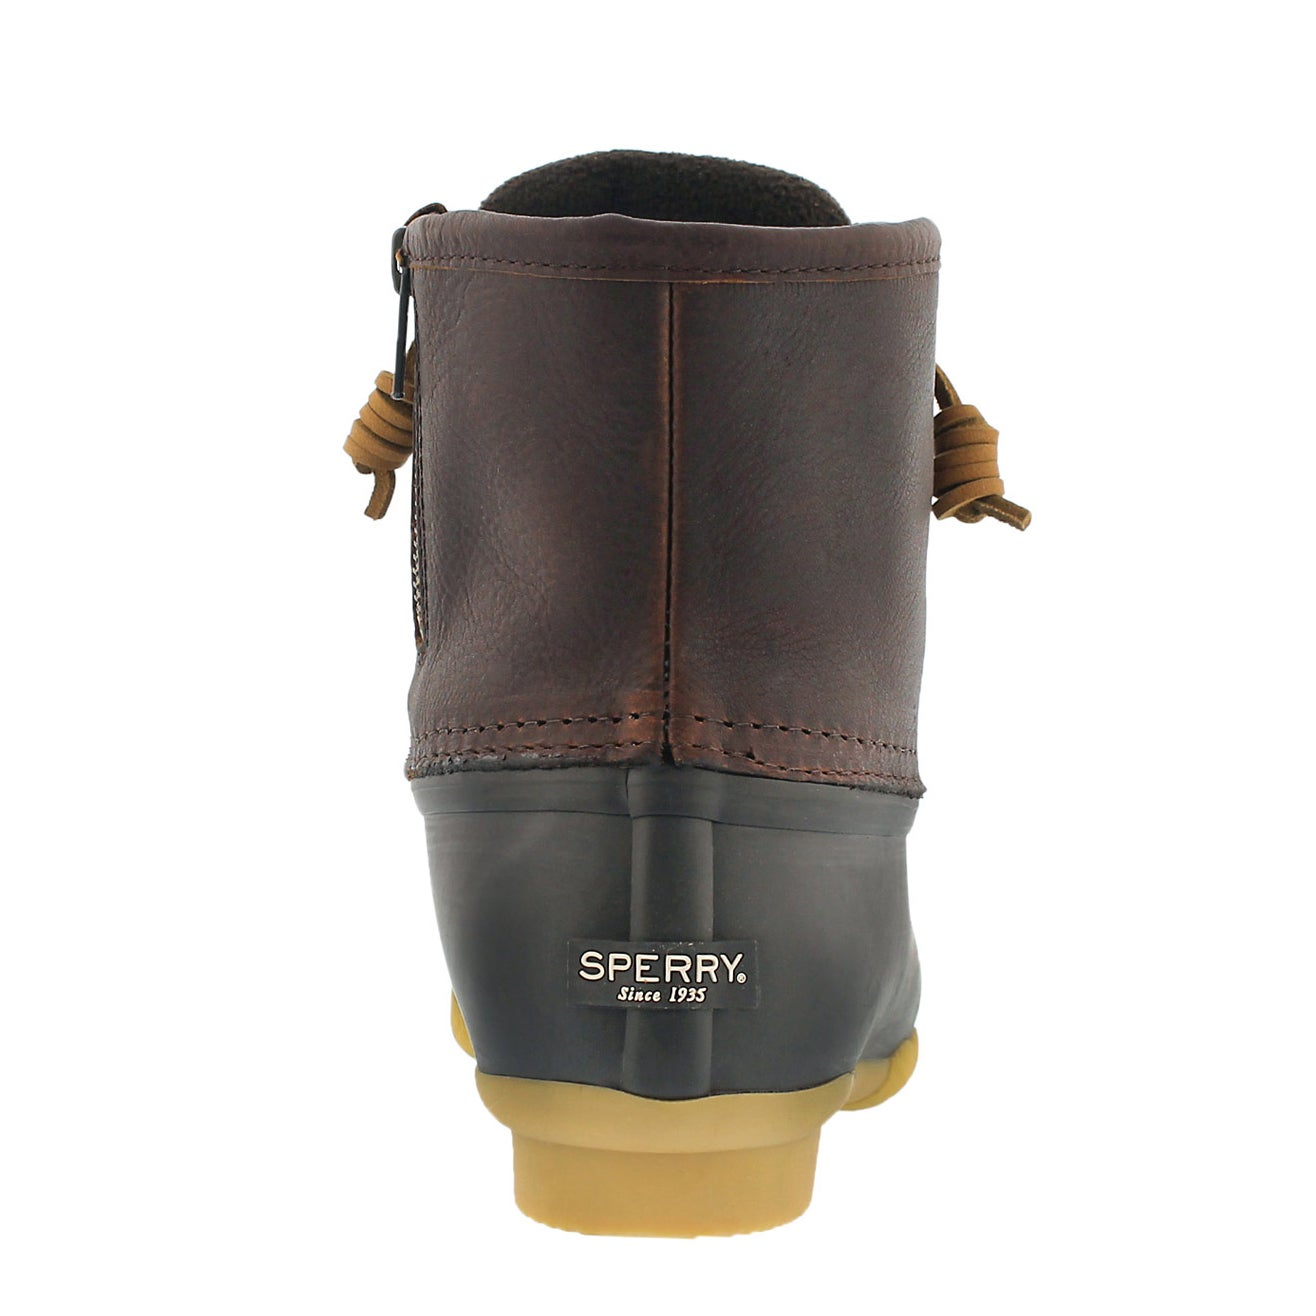 Lds Saltwater tan/brn lined rain boot